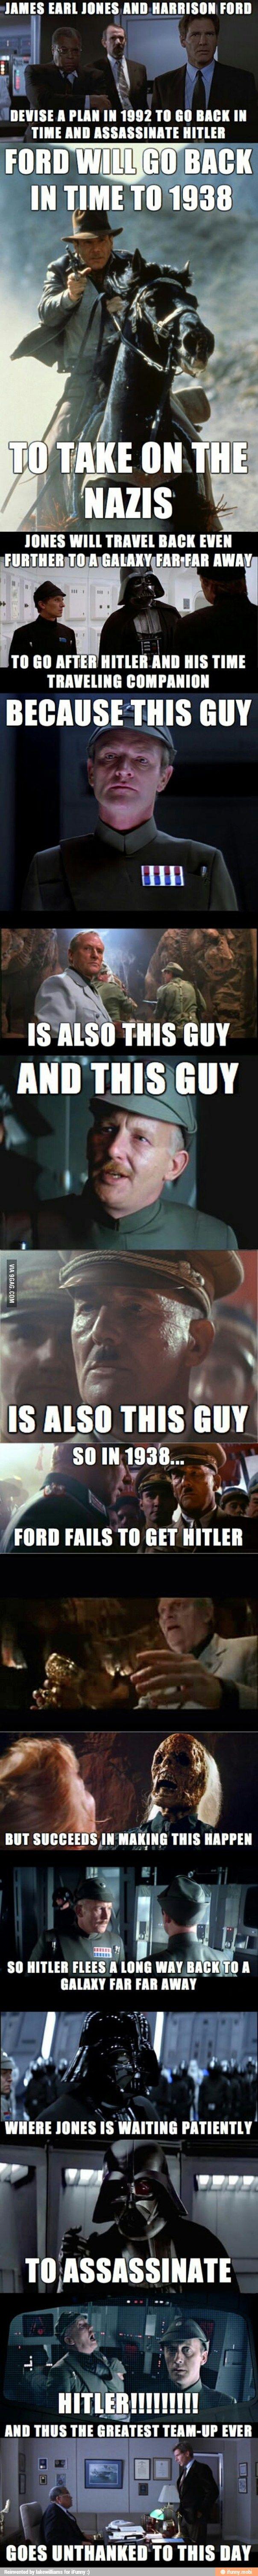 James Earl Jones & Harrison Ford team up to assassinate Hitler. - Star Wars & Indiana Jones